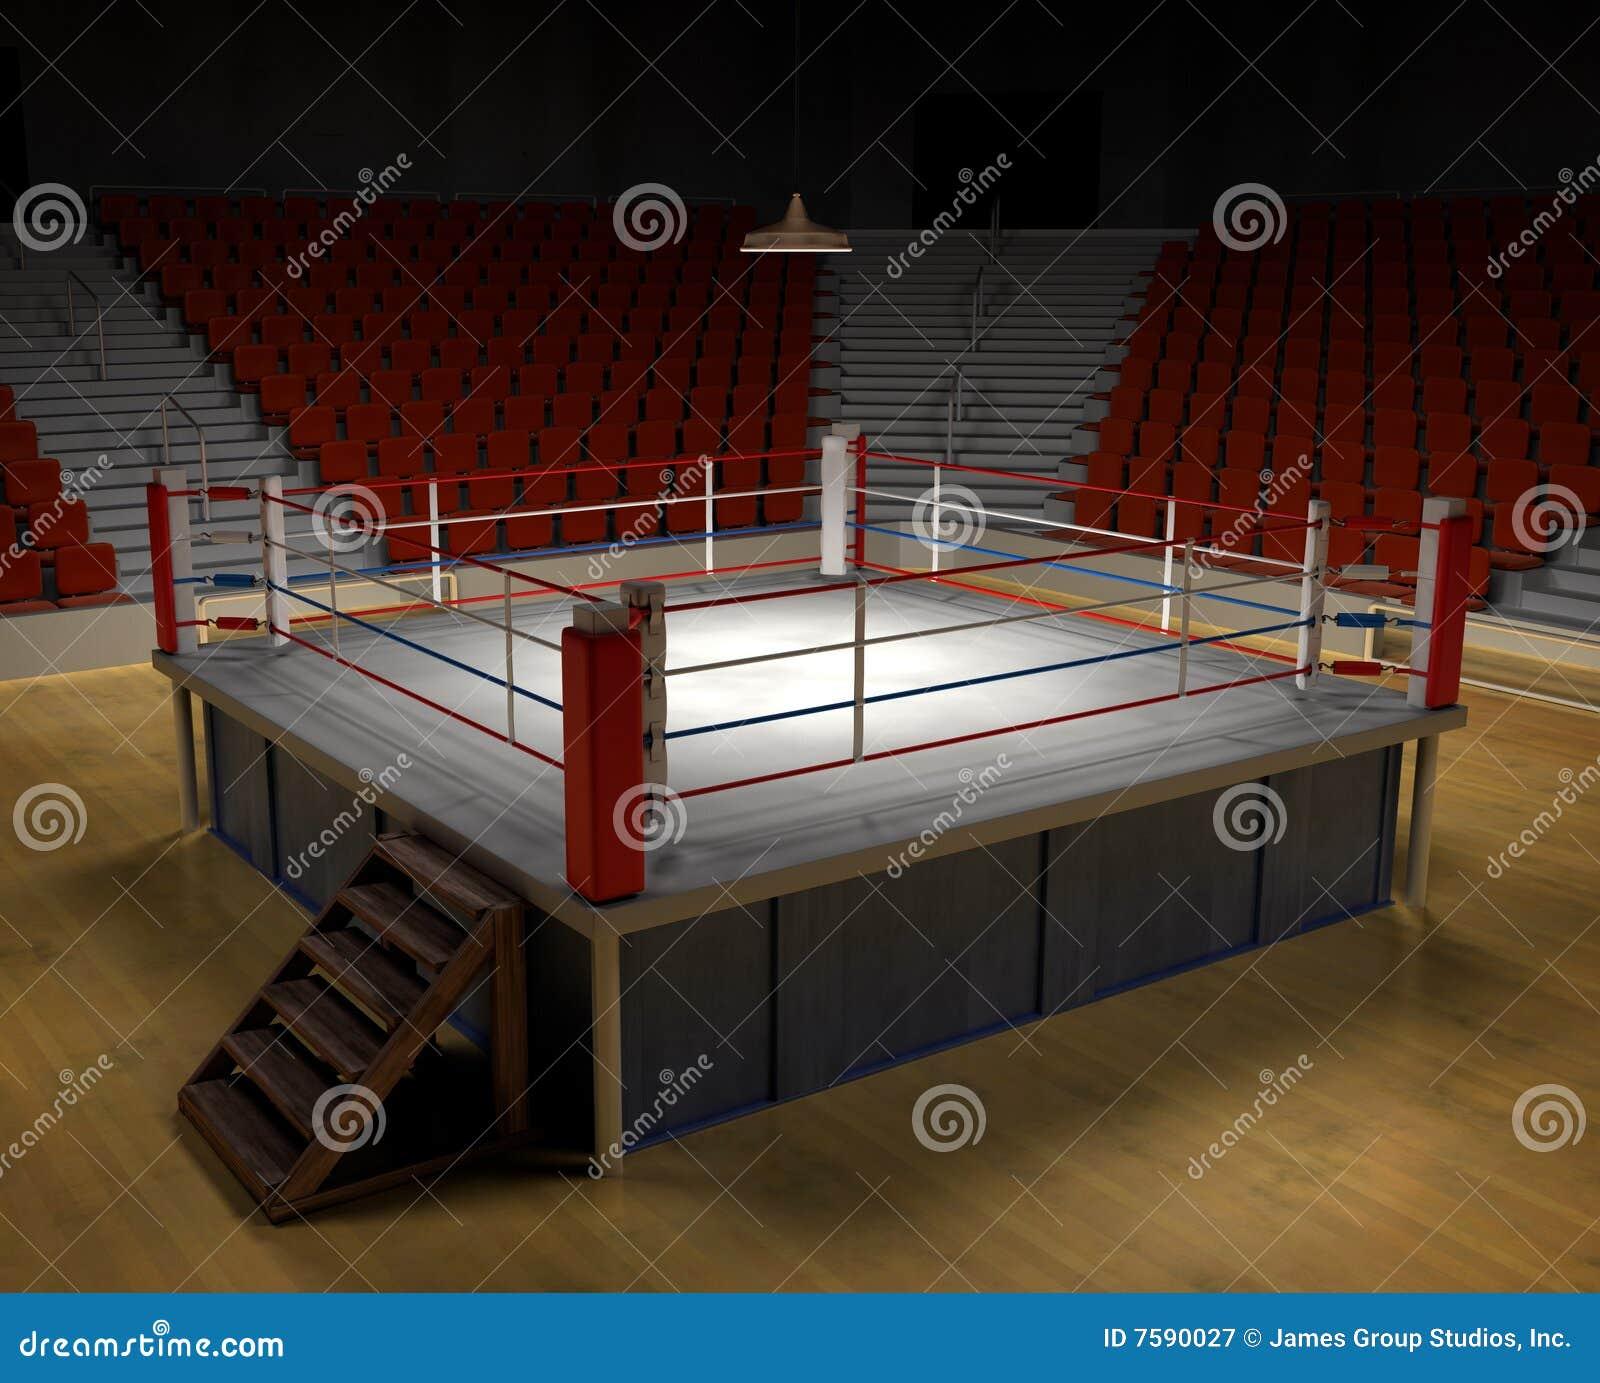 Arenaboxning